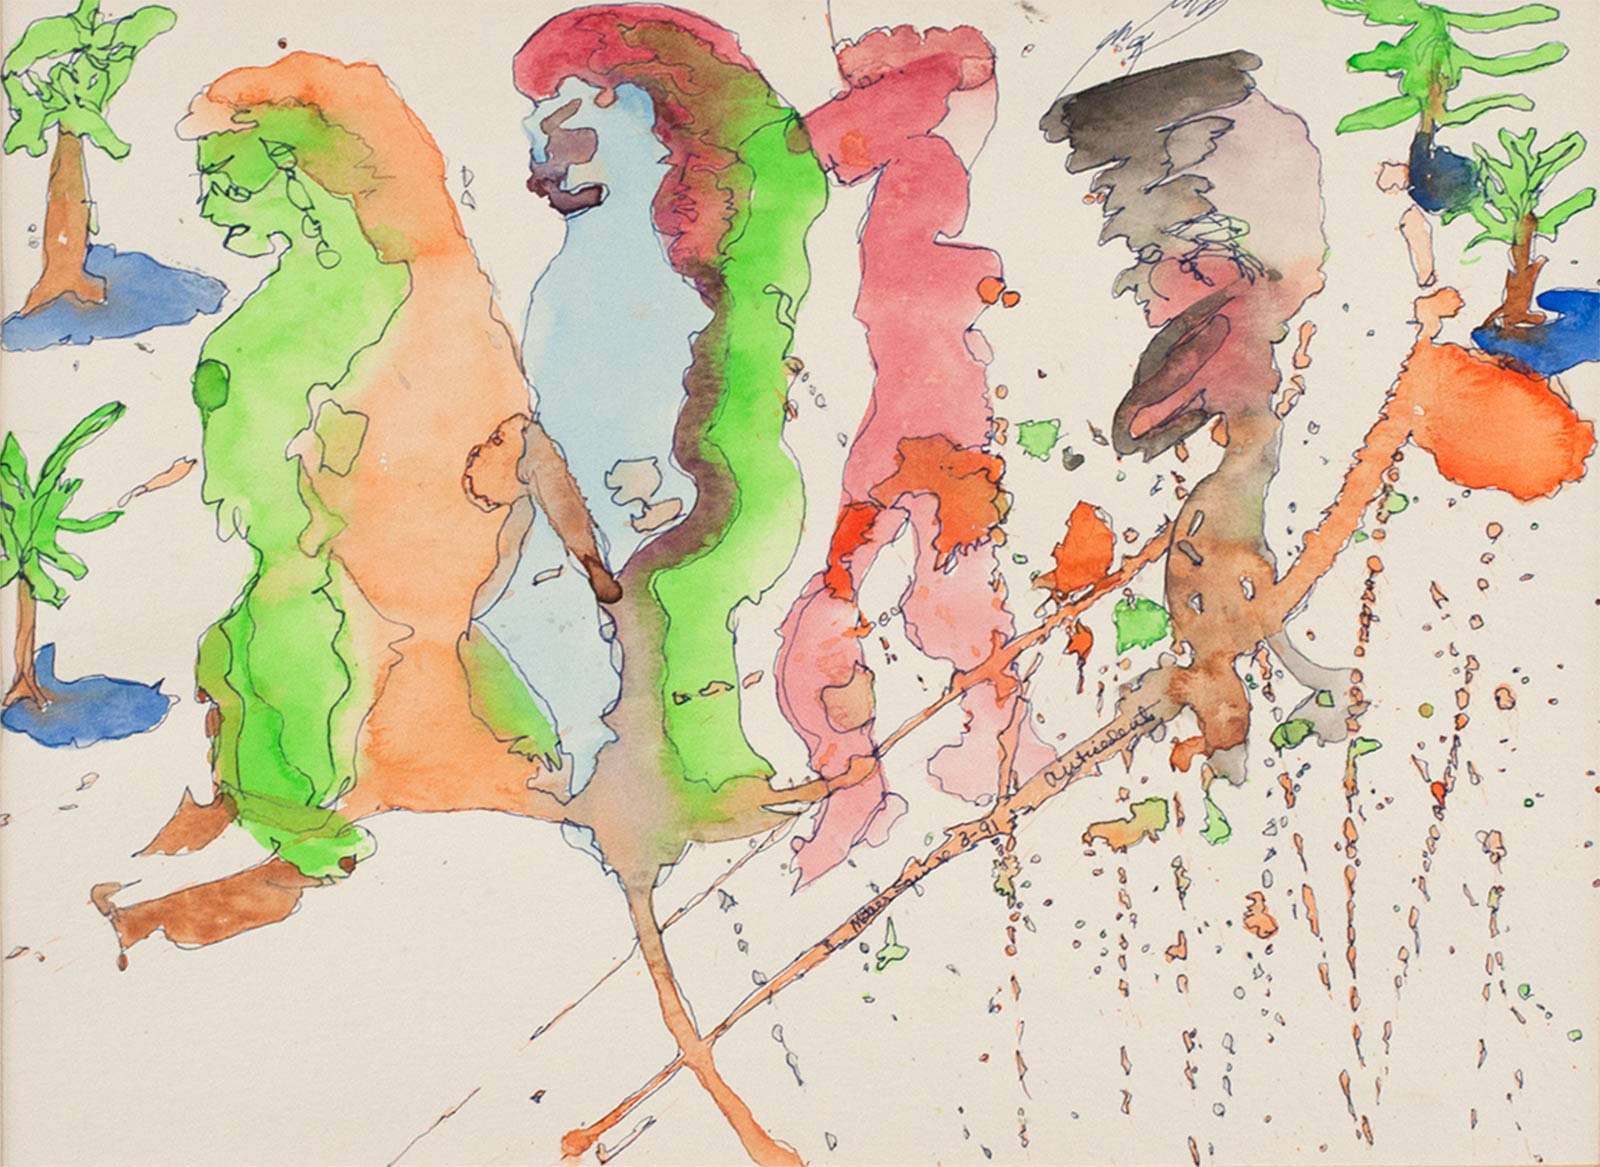 1949-MBS-03_1991-Autisedeut-watercolor-_baz6ny.jpg